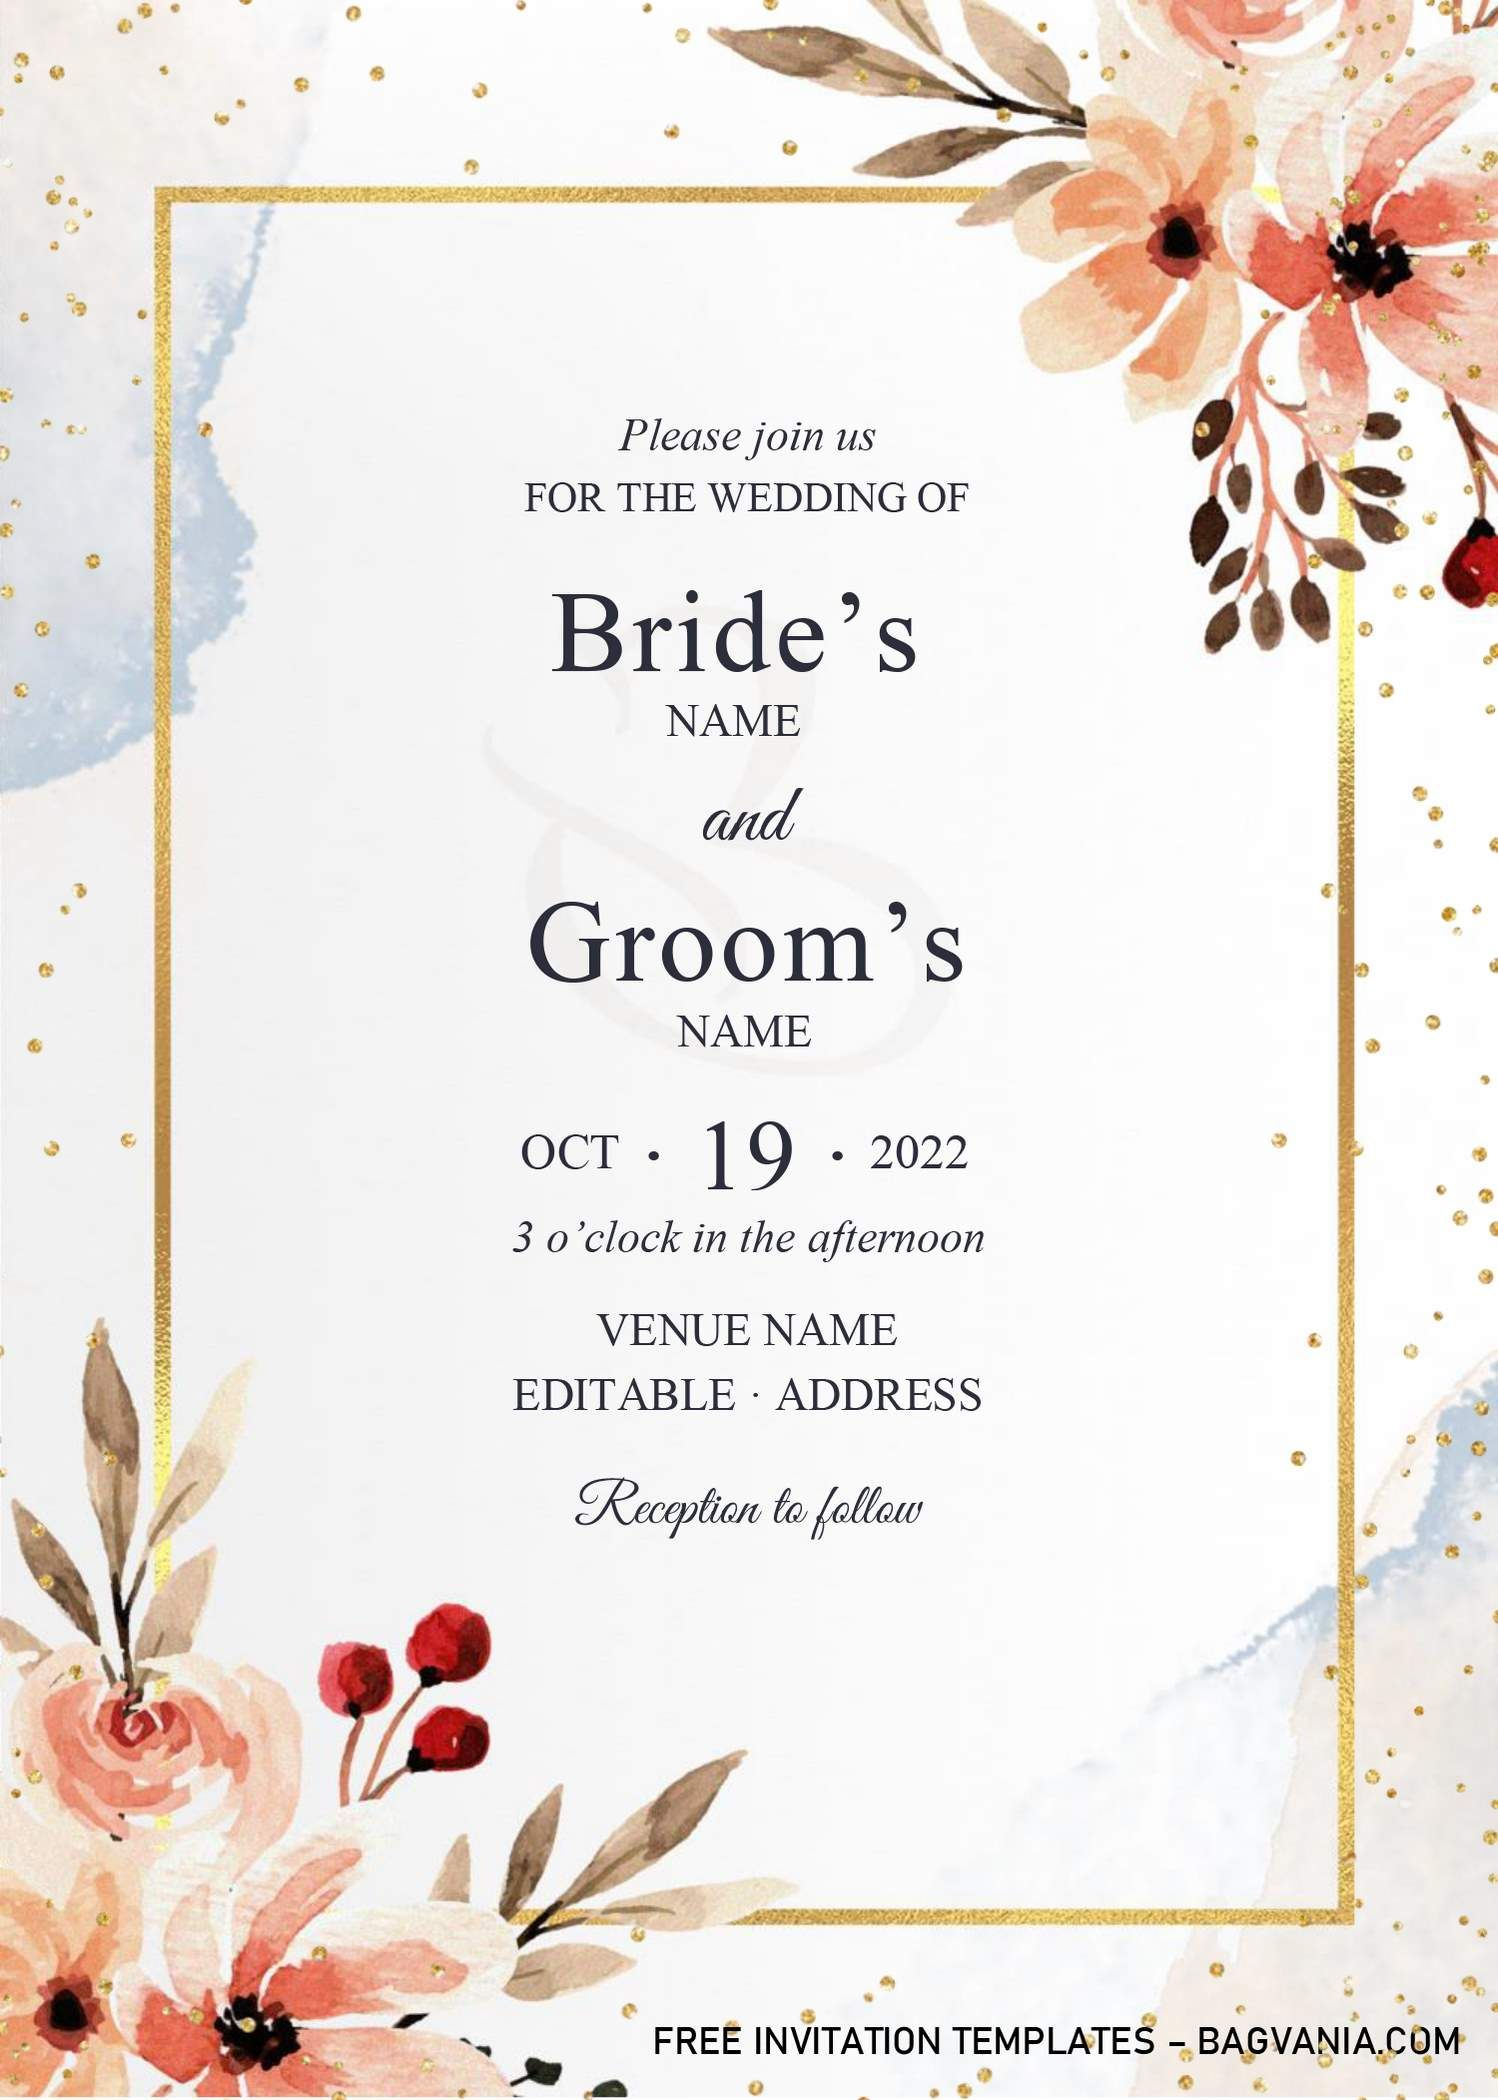 Golden Frame Wedding Invitation Templates Editable With Microsoft Word Invitation Template Wedding Invitation Templates Free Printable Birthday Invitations